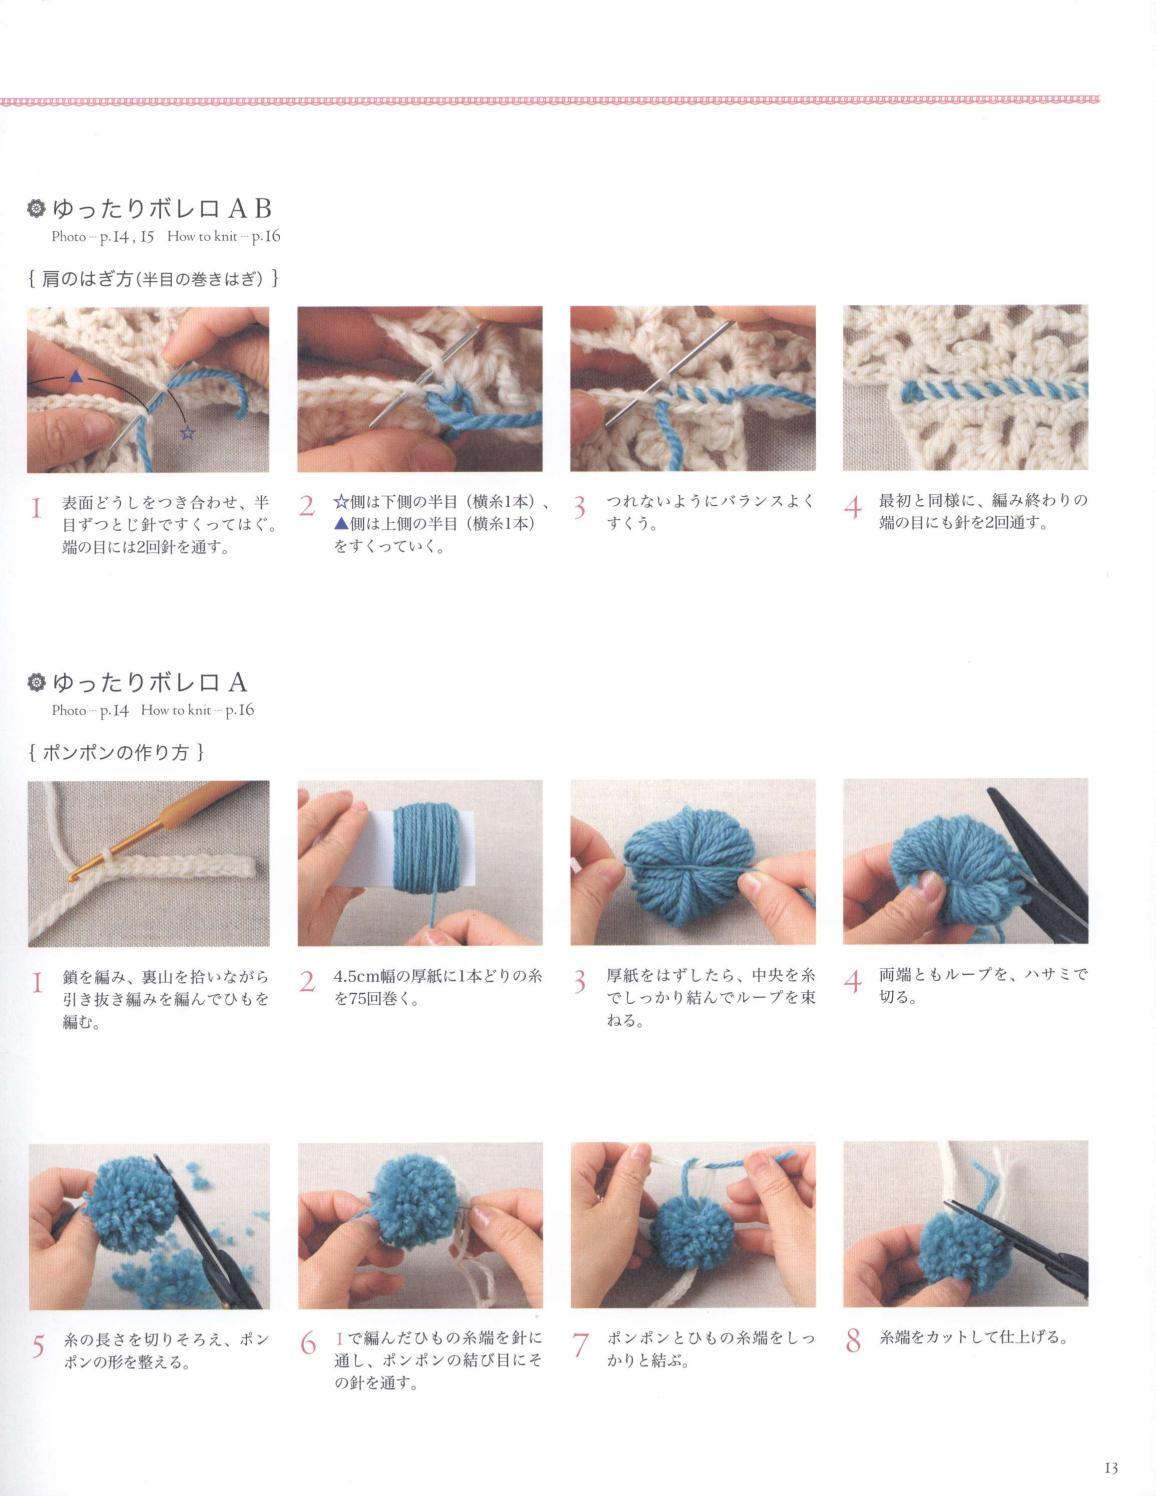 Asahi original crochet best selection 2012 page 13